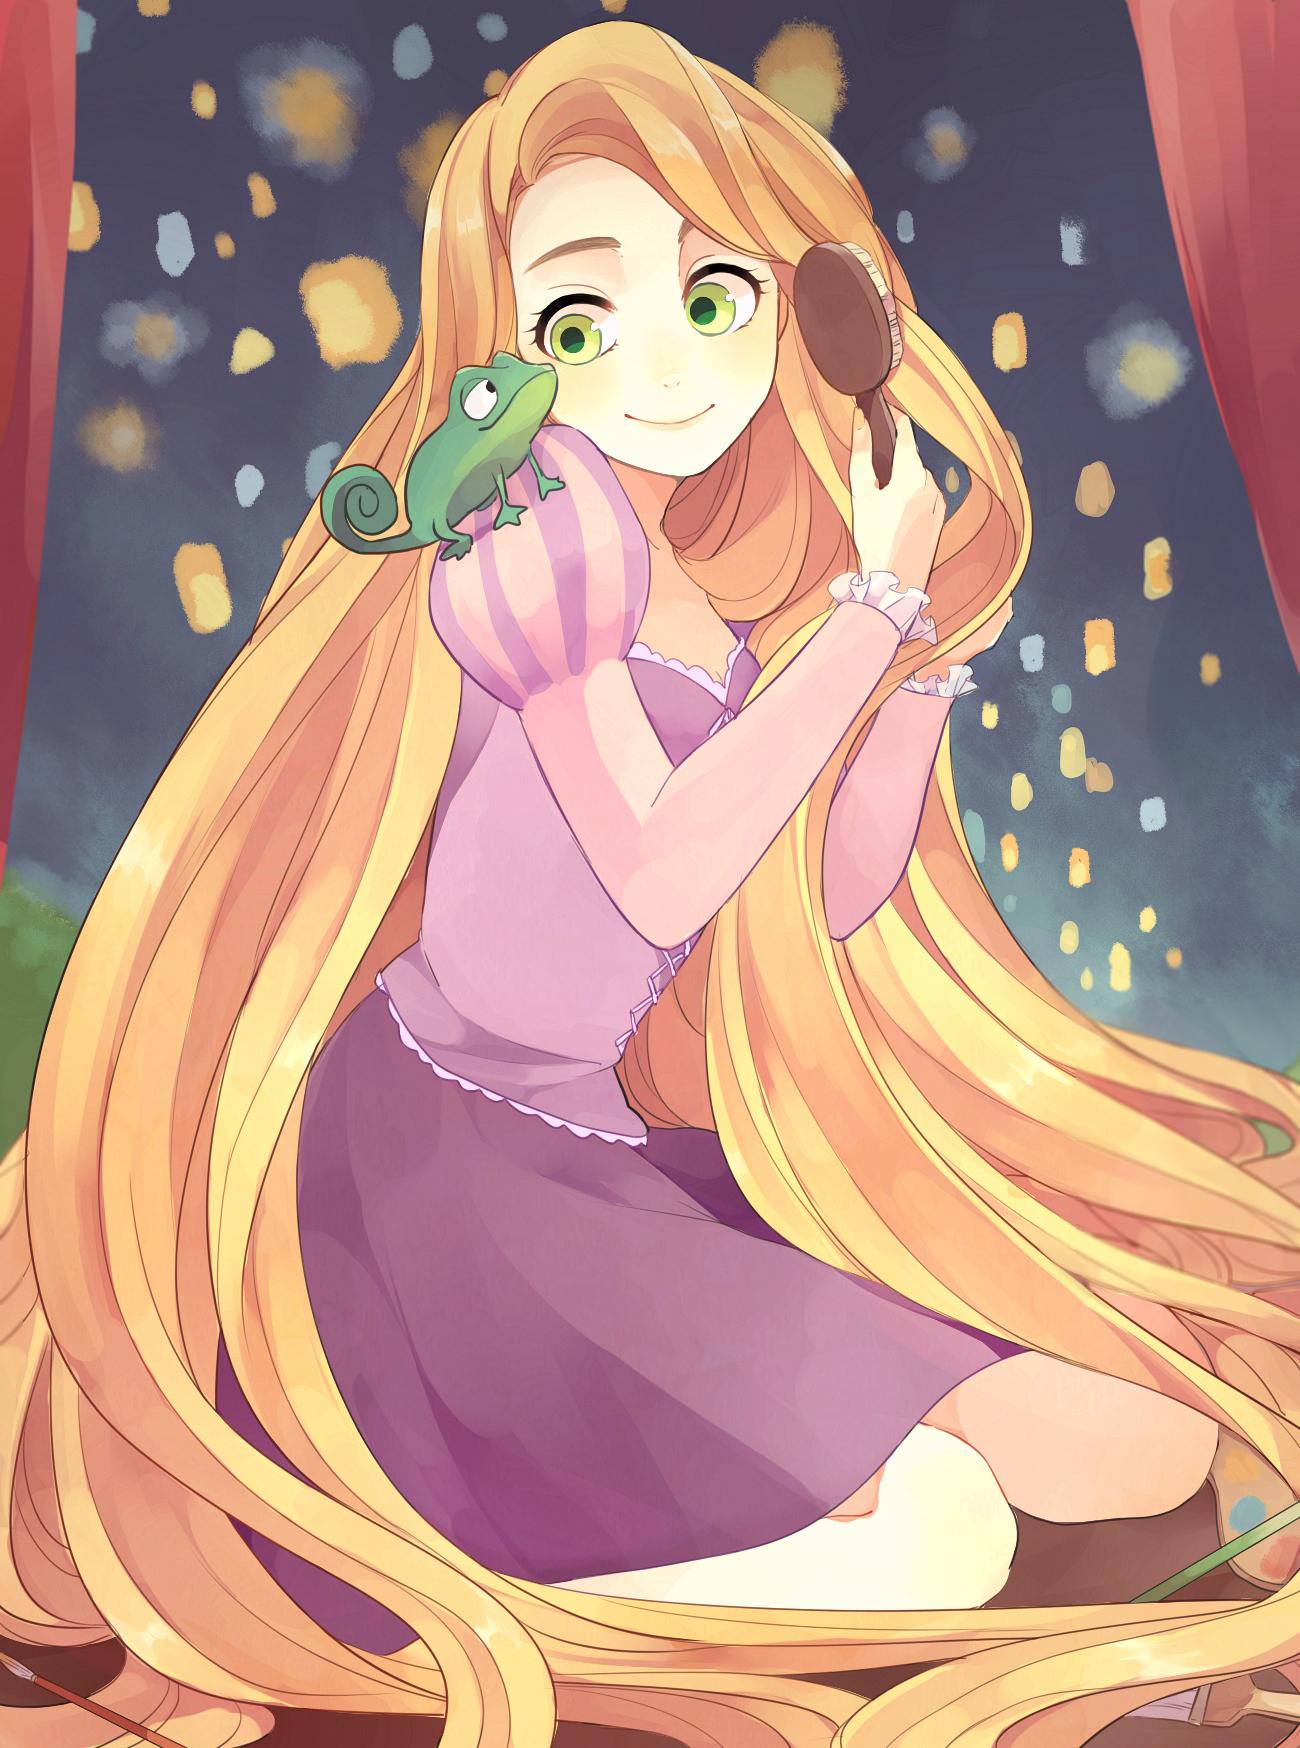 Sfondi cartone animato walt disney ingarbugliato rapunzel